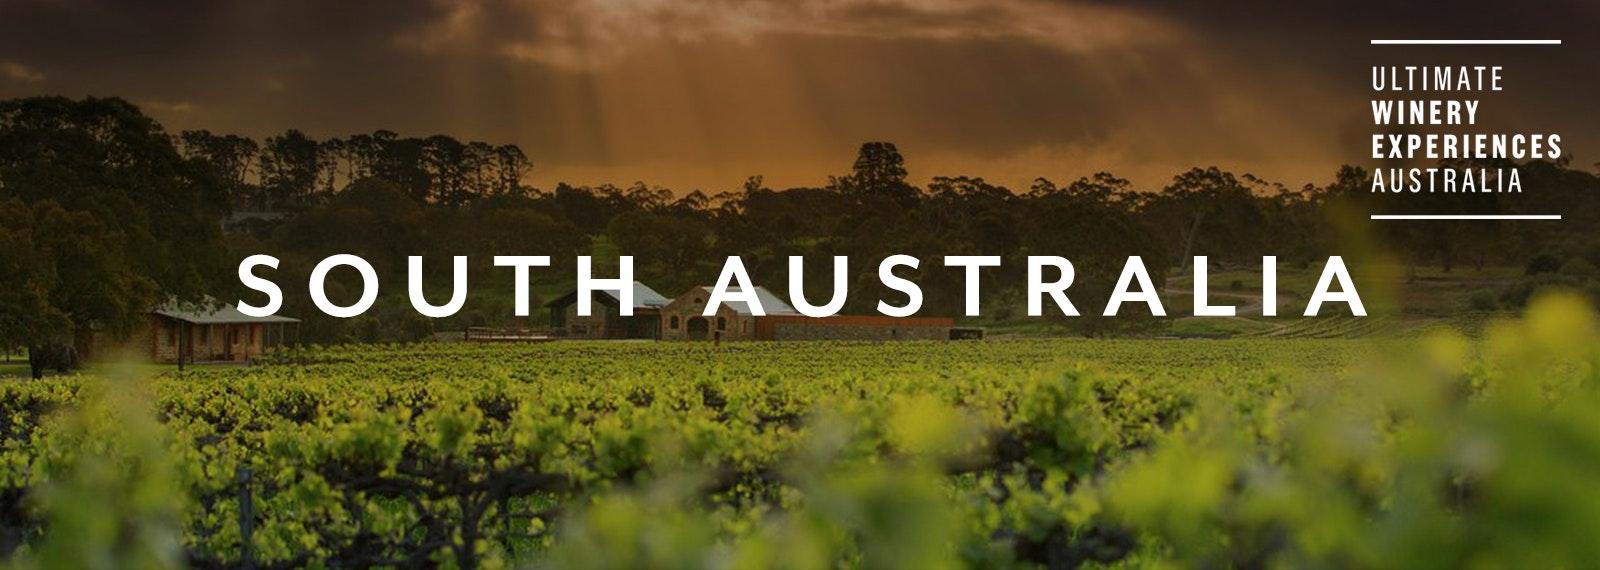 Ultimate Winery Experiences Australia - South Australia